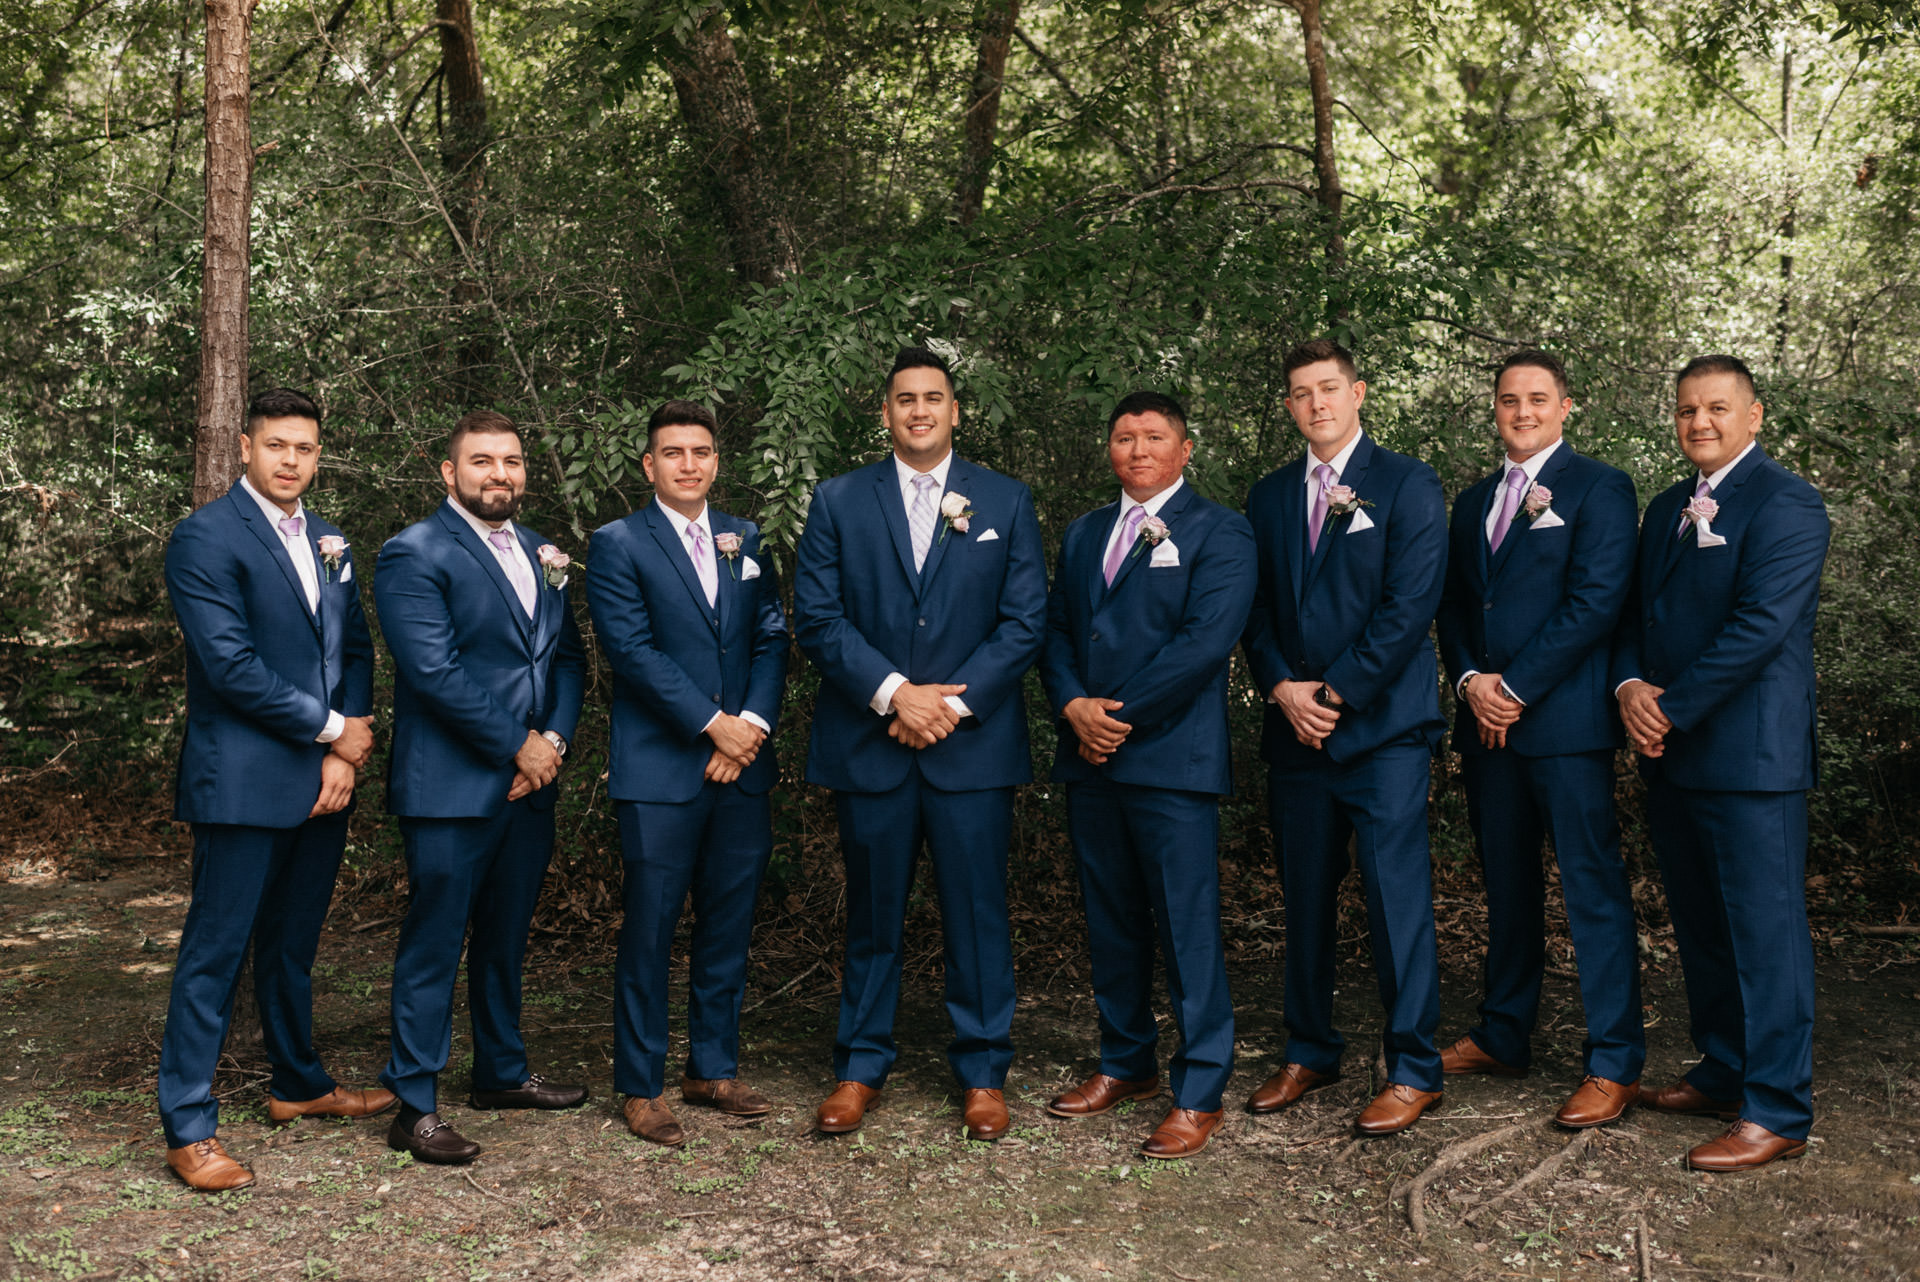 lexi-michael-wedding-blog-sm-40.jpg